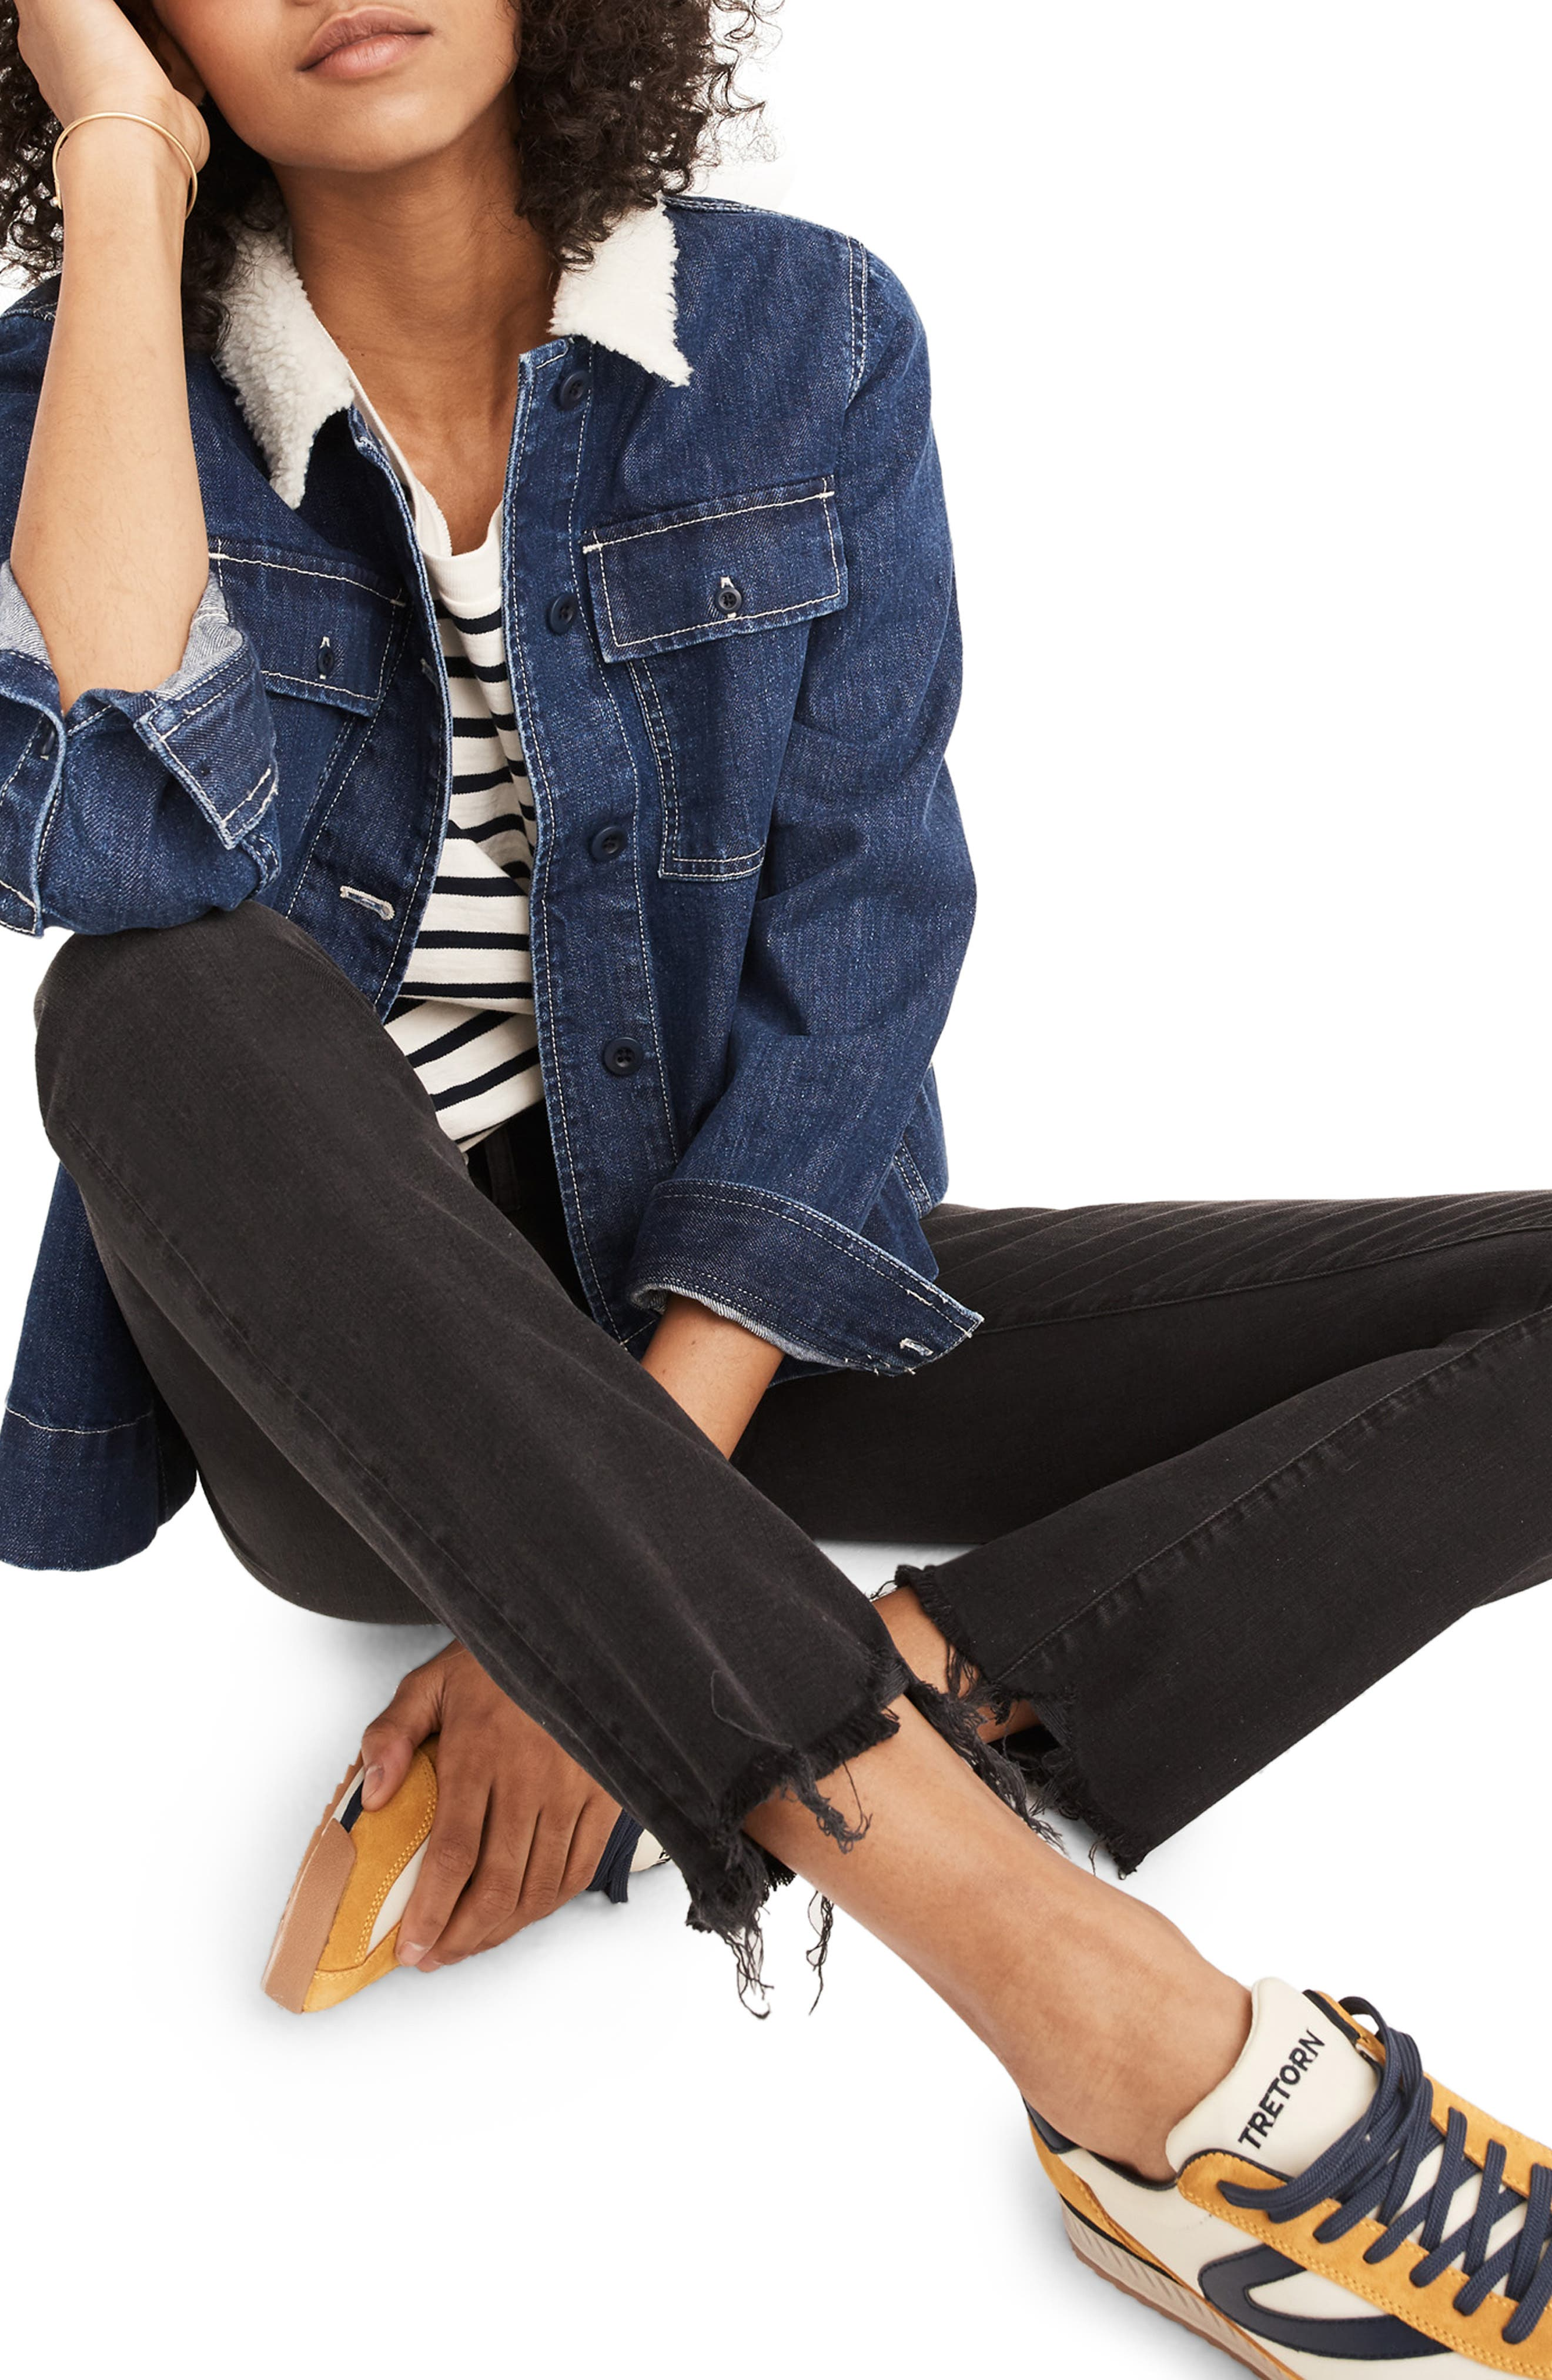 MADEWELL, Cali Chewed Hem Demi Bootcut Jeans, Main thumbnail 1, color, BERKELEY